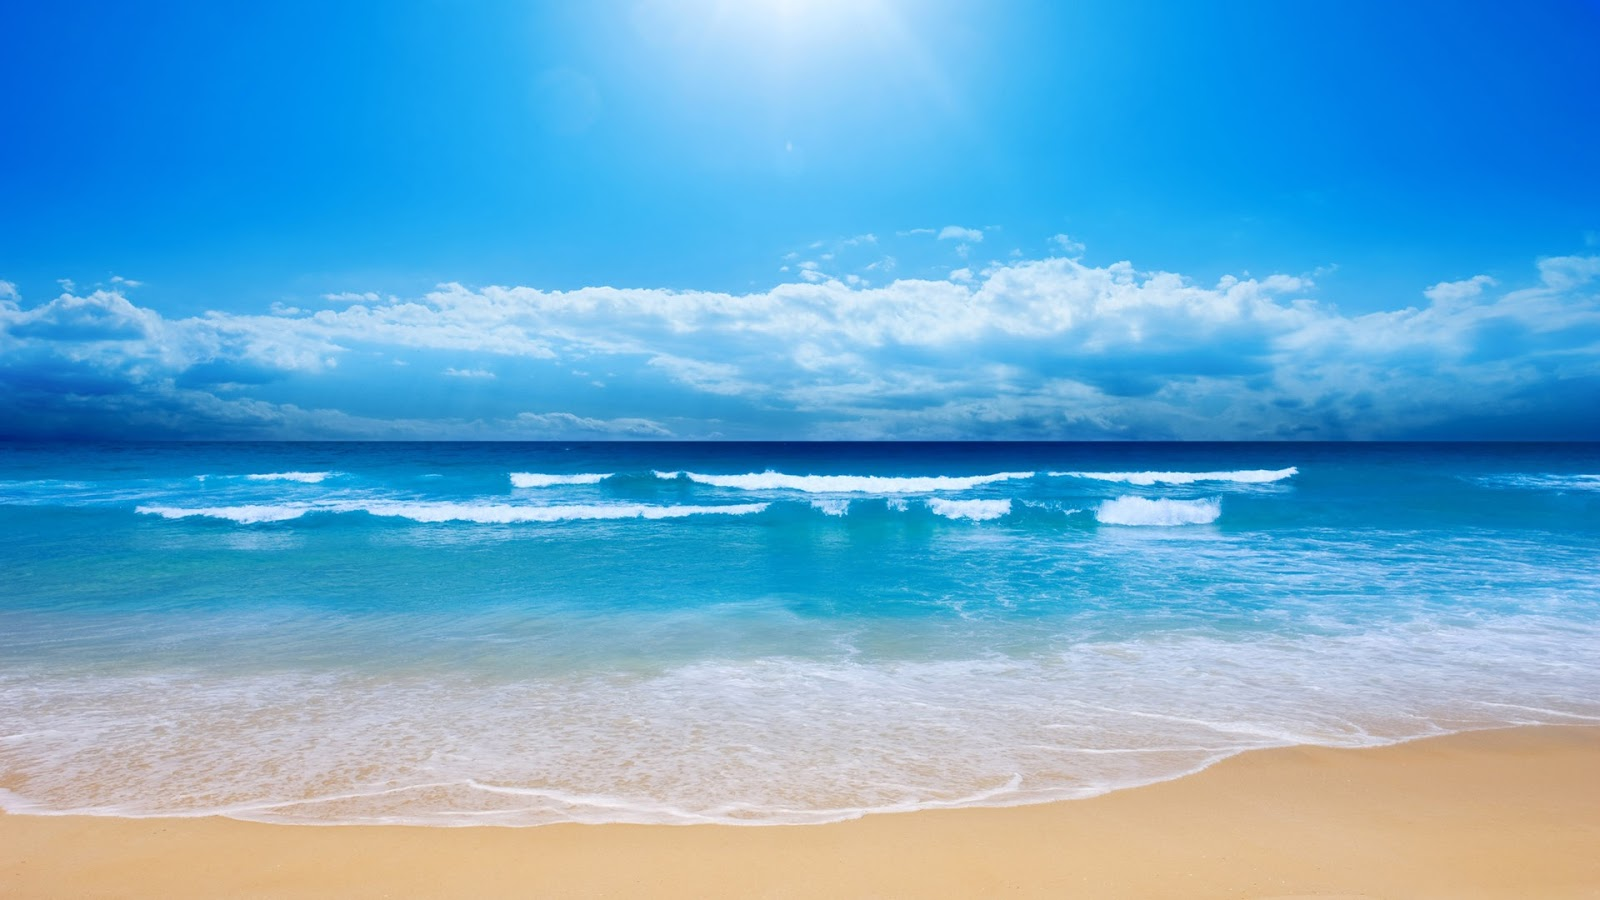 Blue Ocean Sea